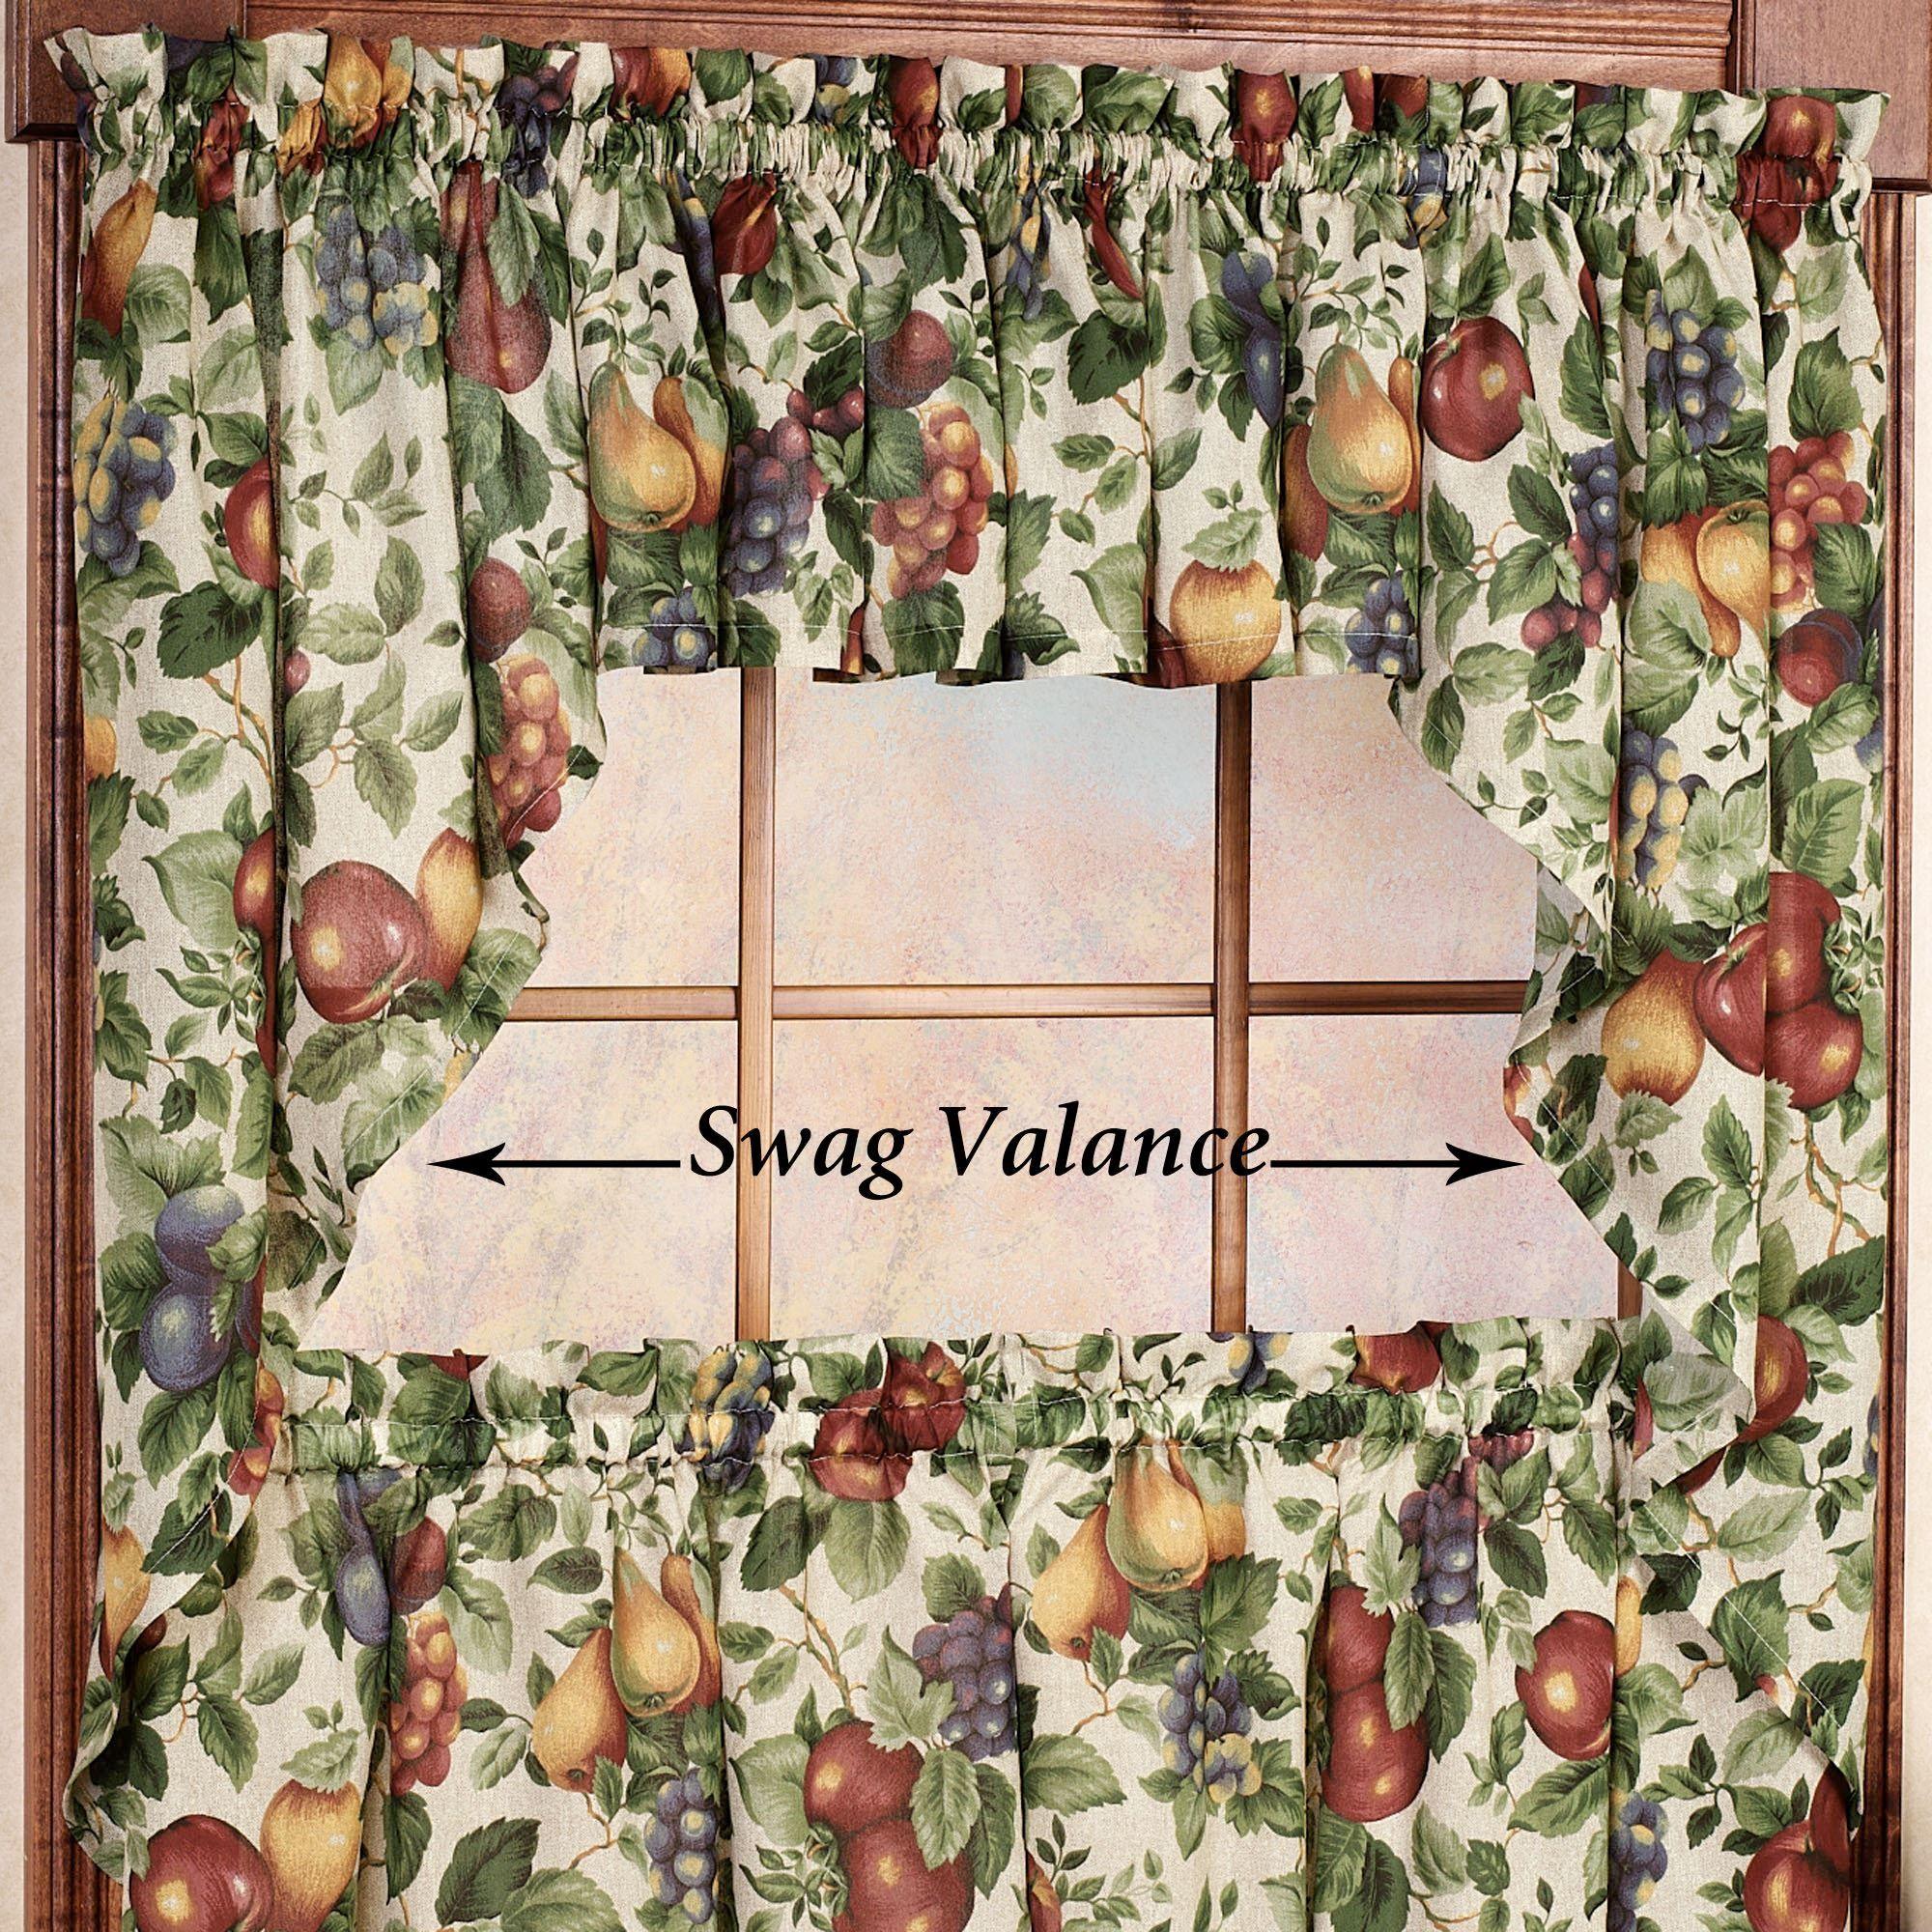 Kitchen Curtain Fruit Swag: Sonoma Fruit Tier Window Treatments